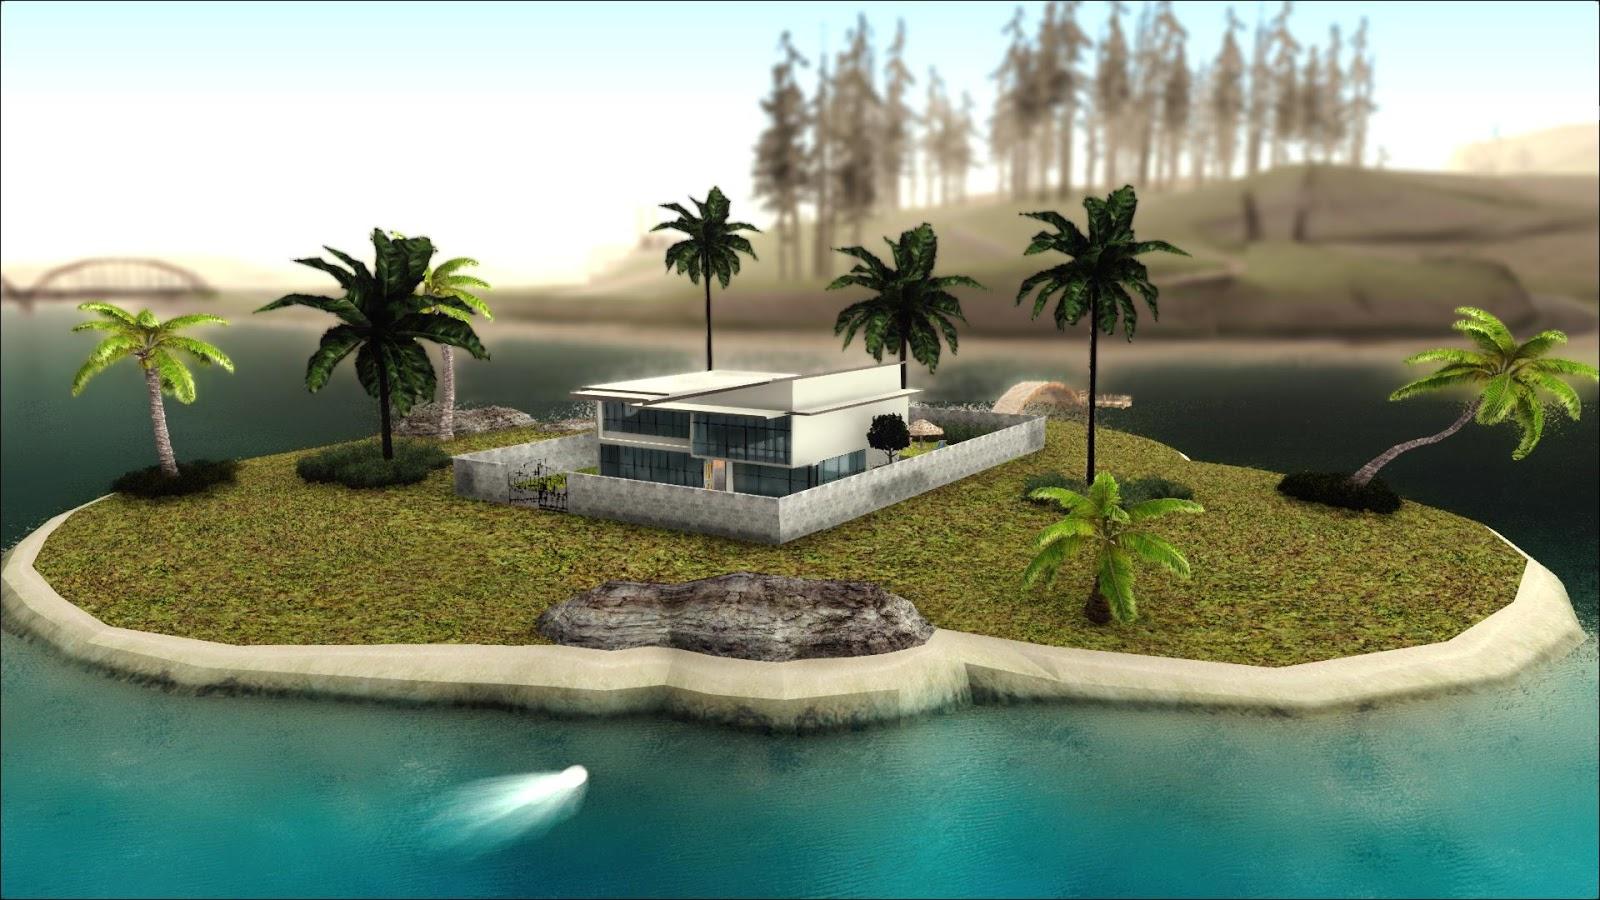 Diego4Fun Zone MAPDiegoforfuns Modern House MOD